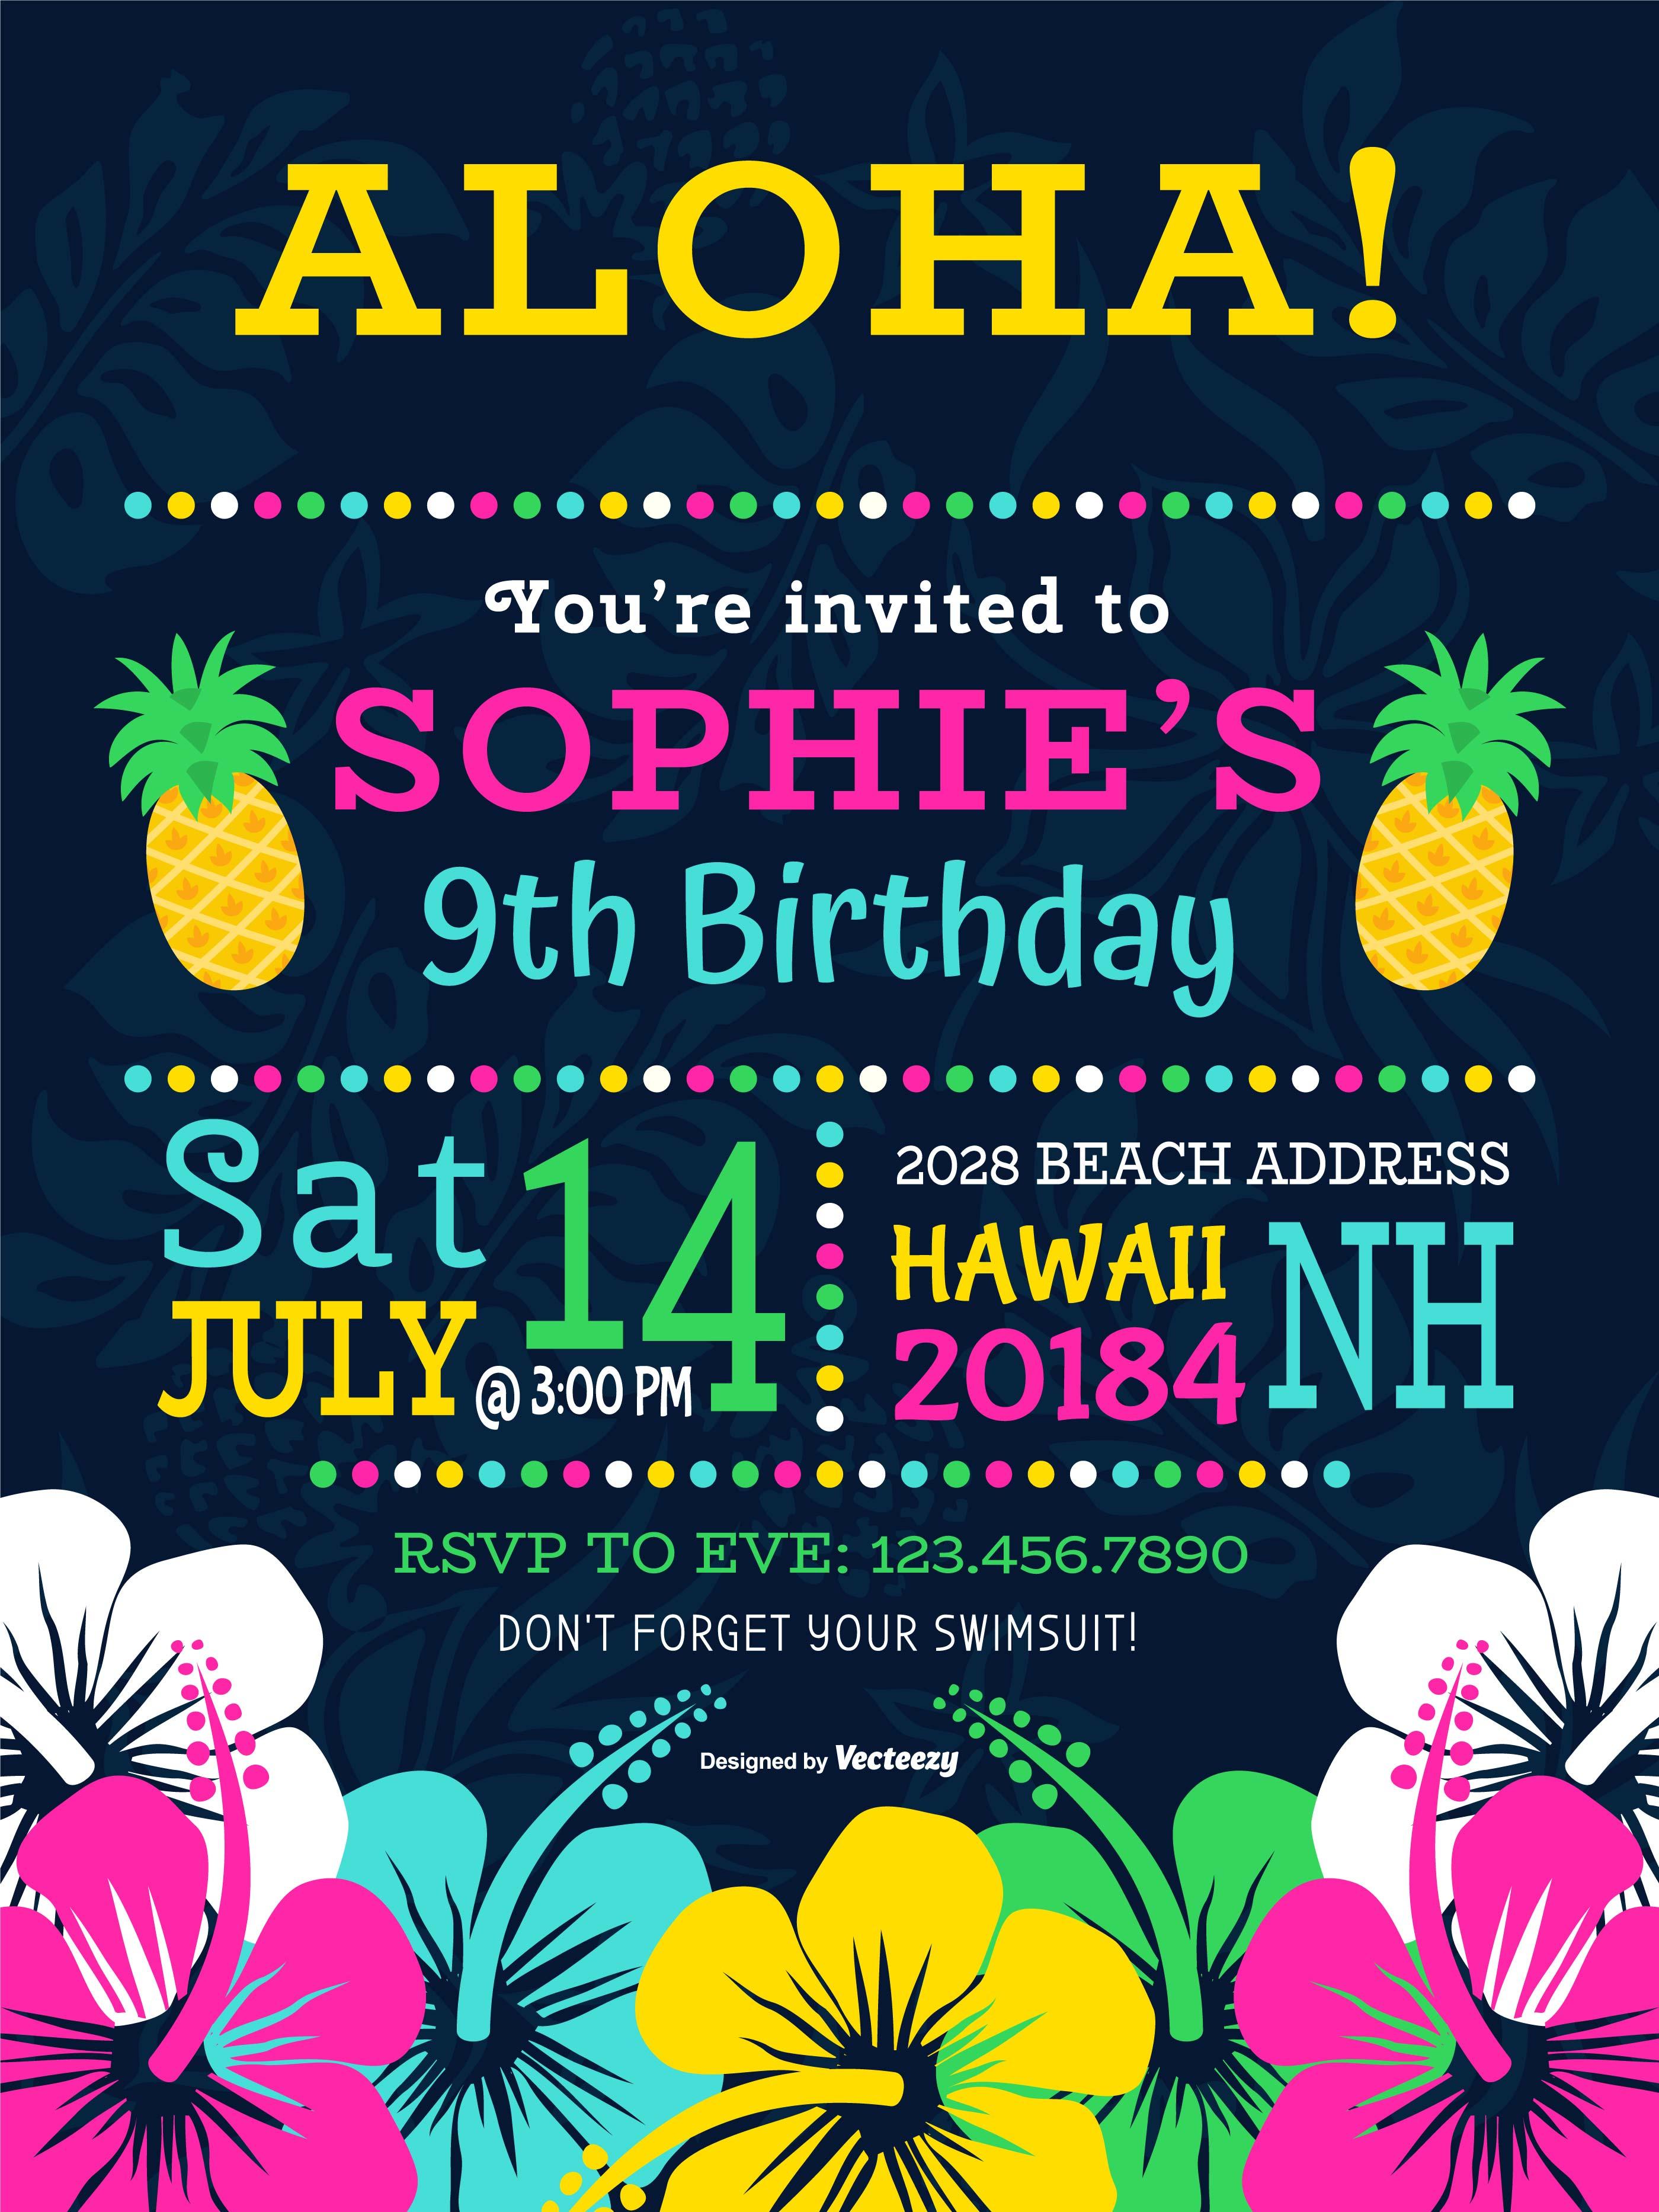 Free vector birthday invitation 5986 free downloads stopboris Images